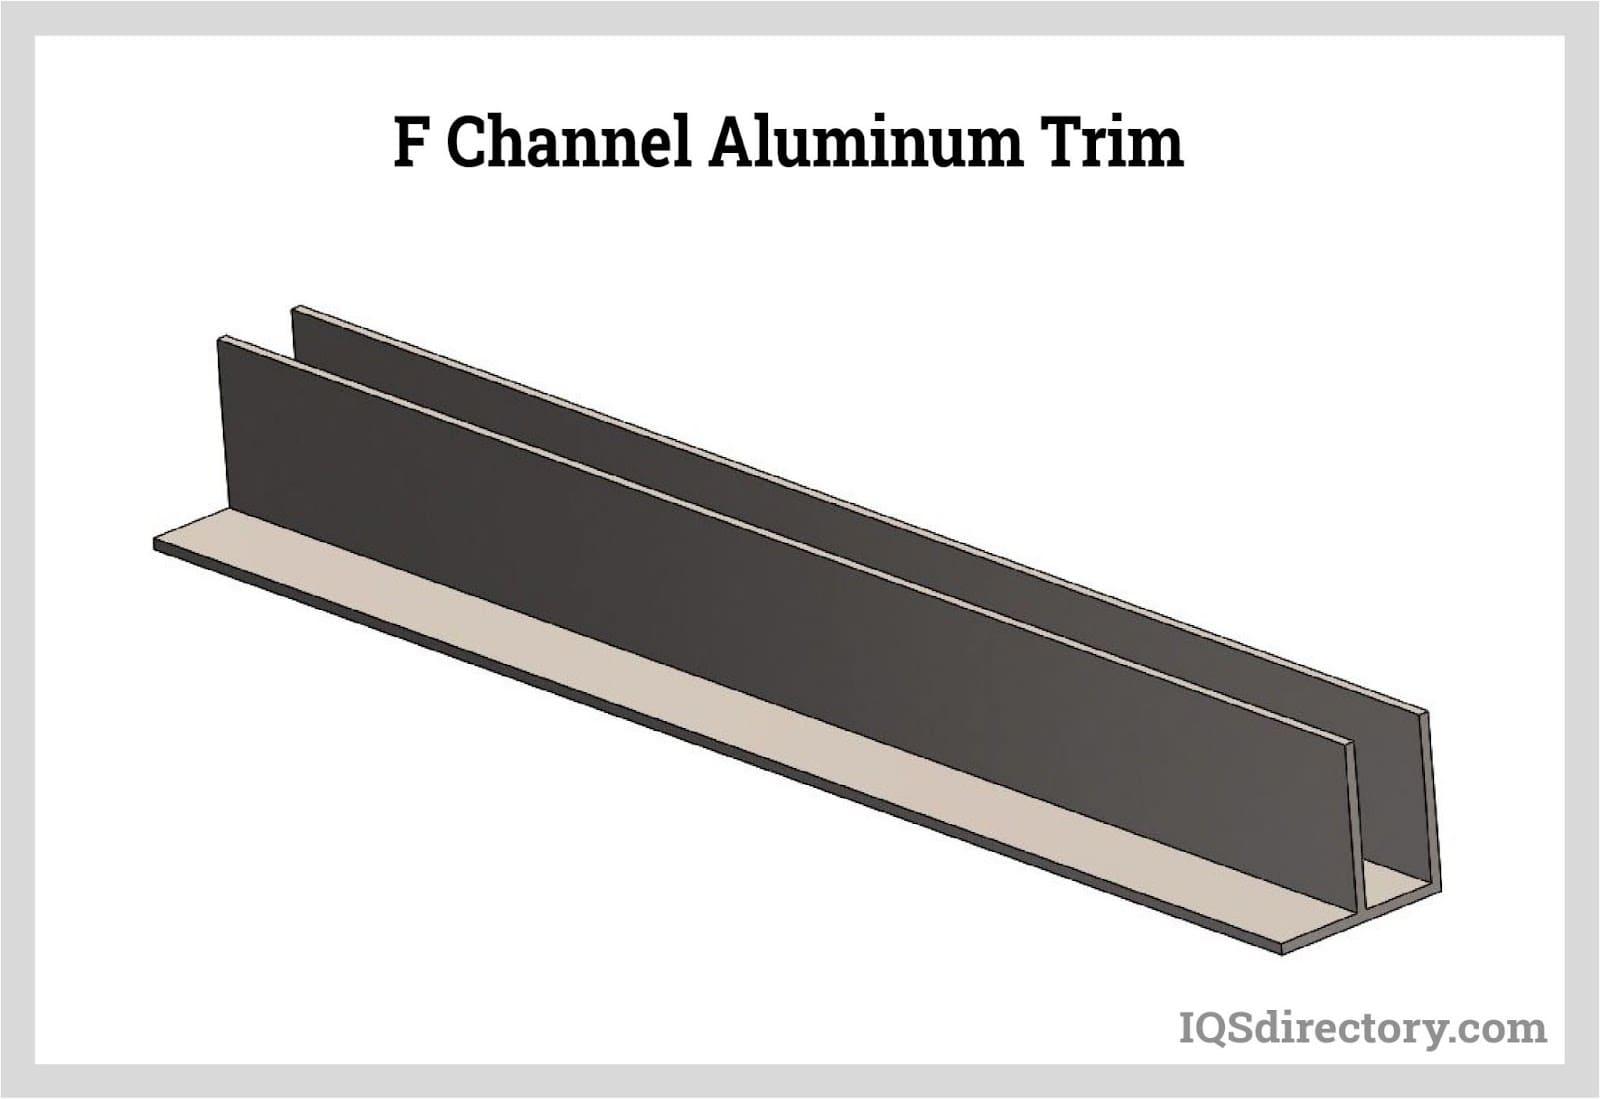 F Channel Aluminum Trim